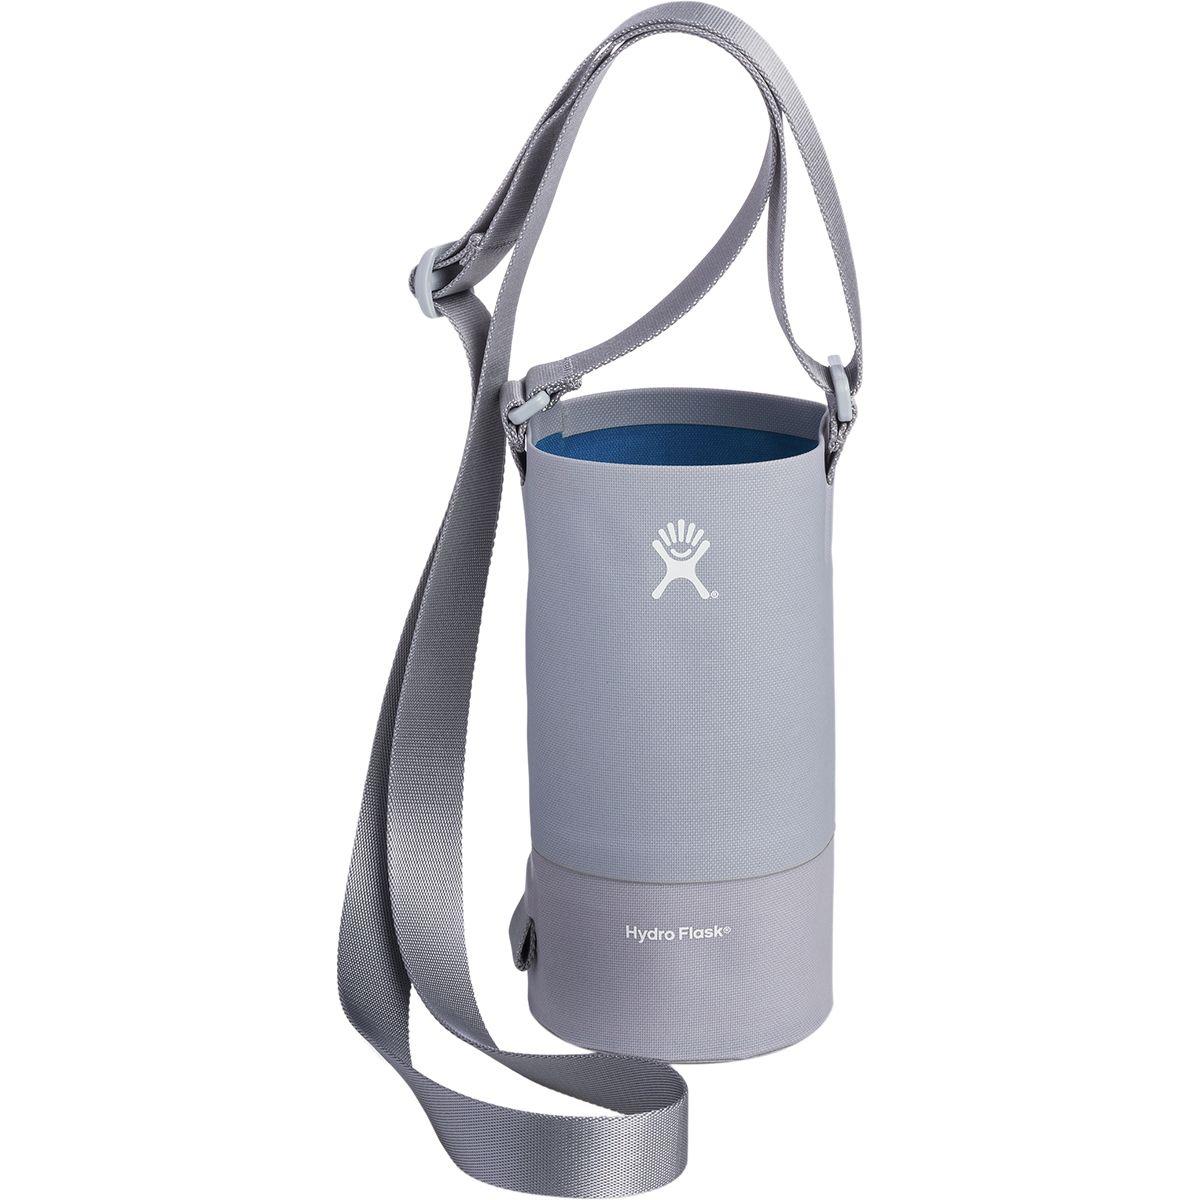 Hydro Flask Medium Tag Along Bottle Sling